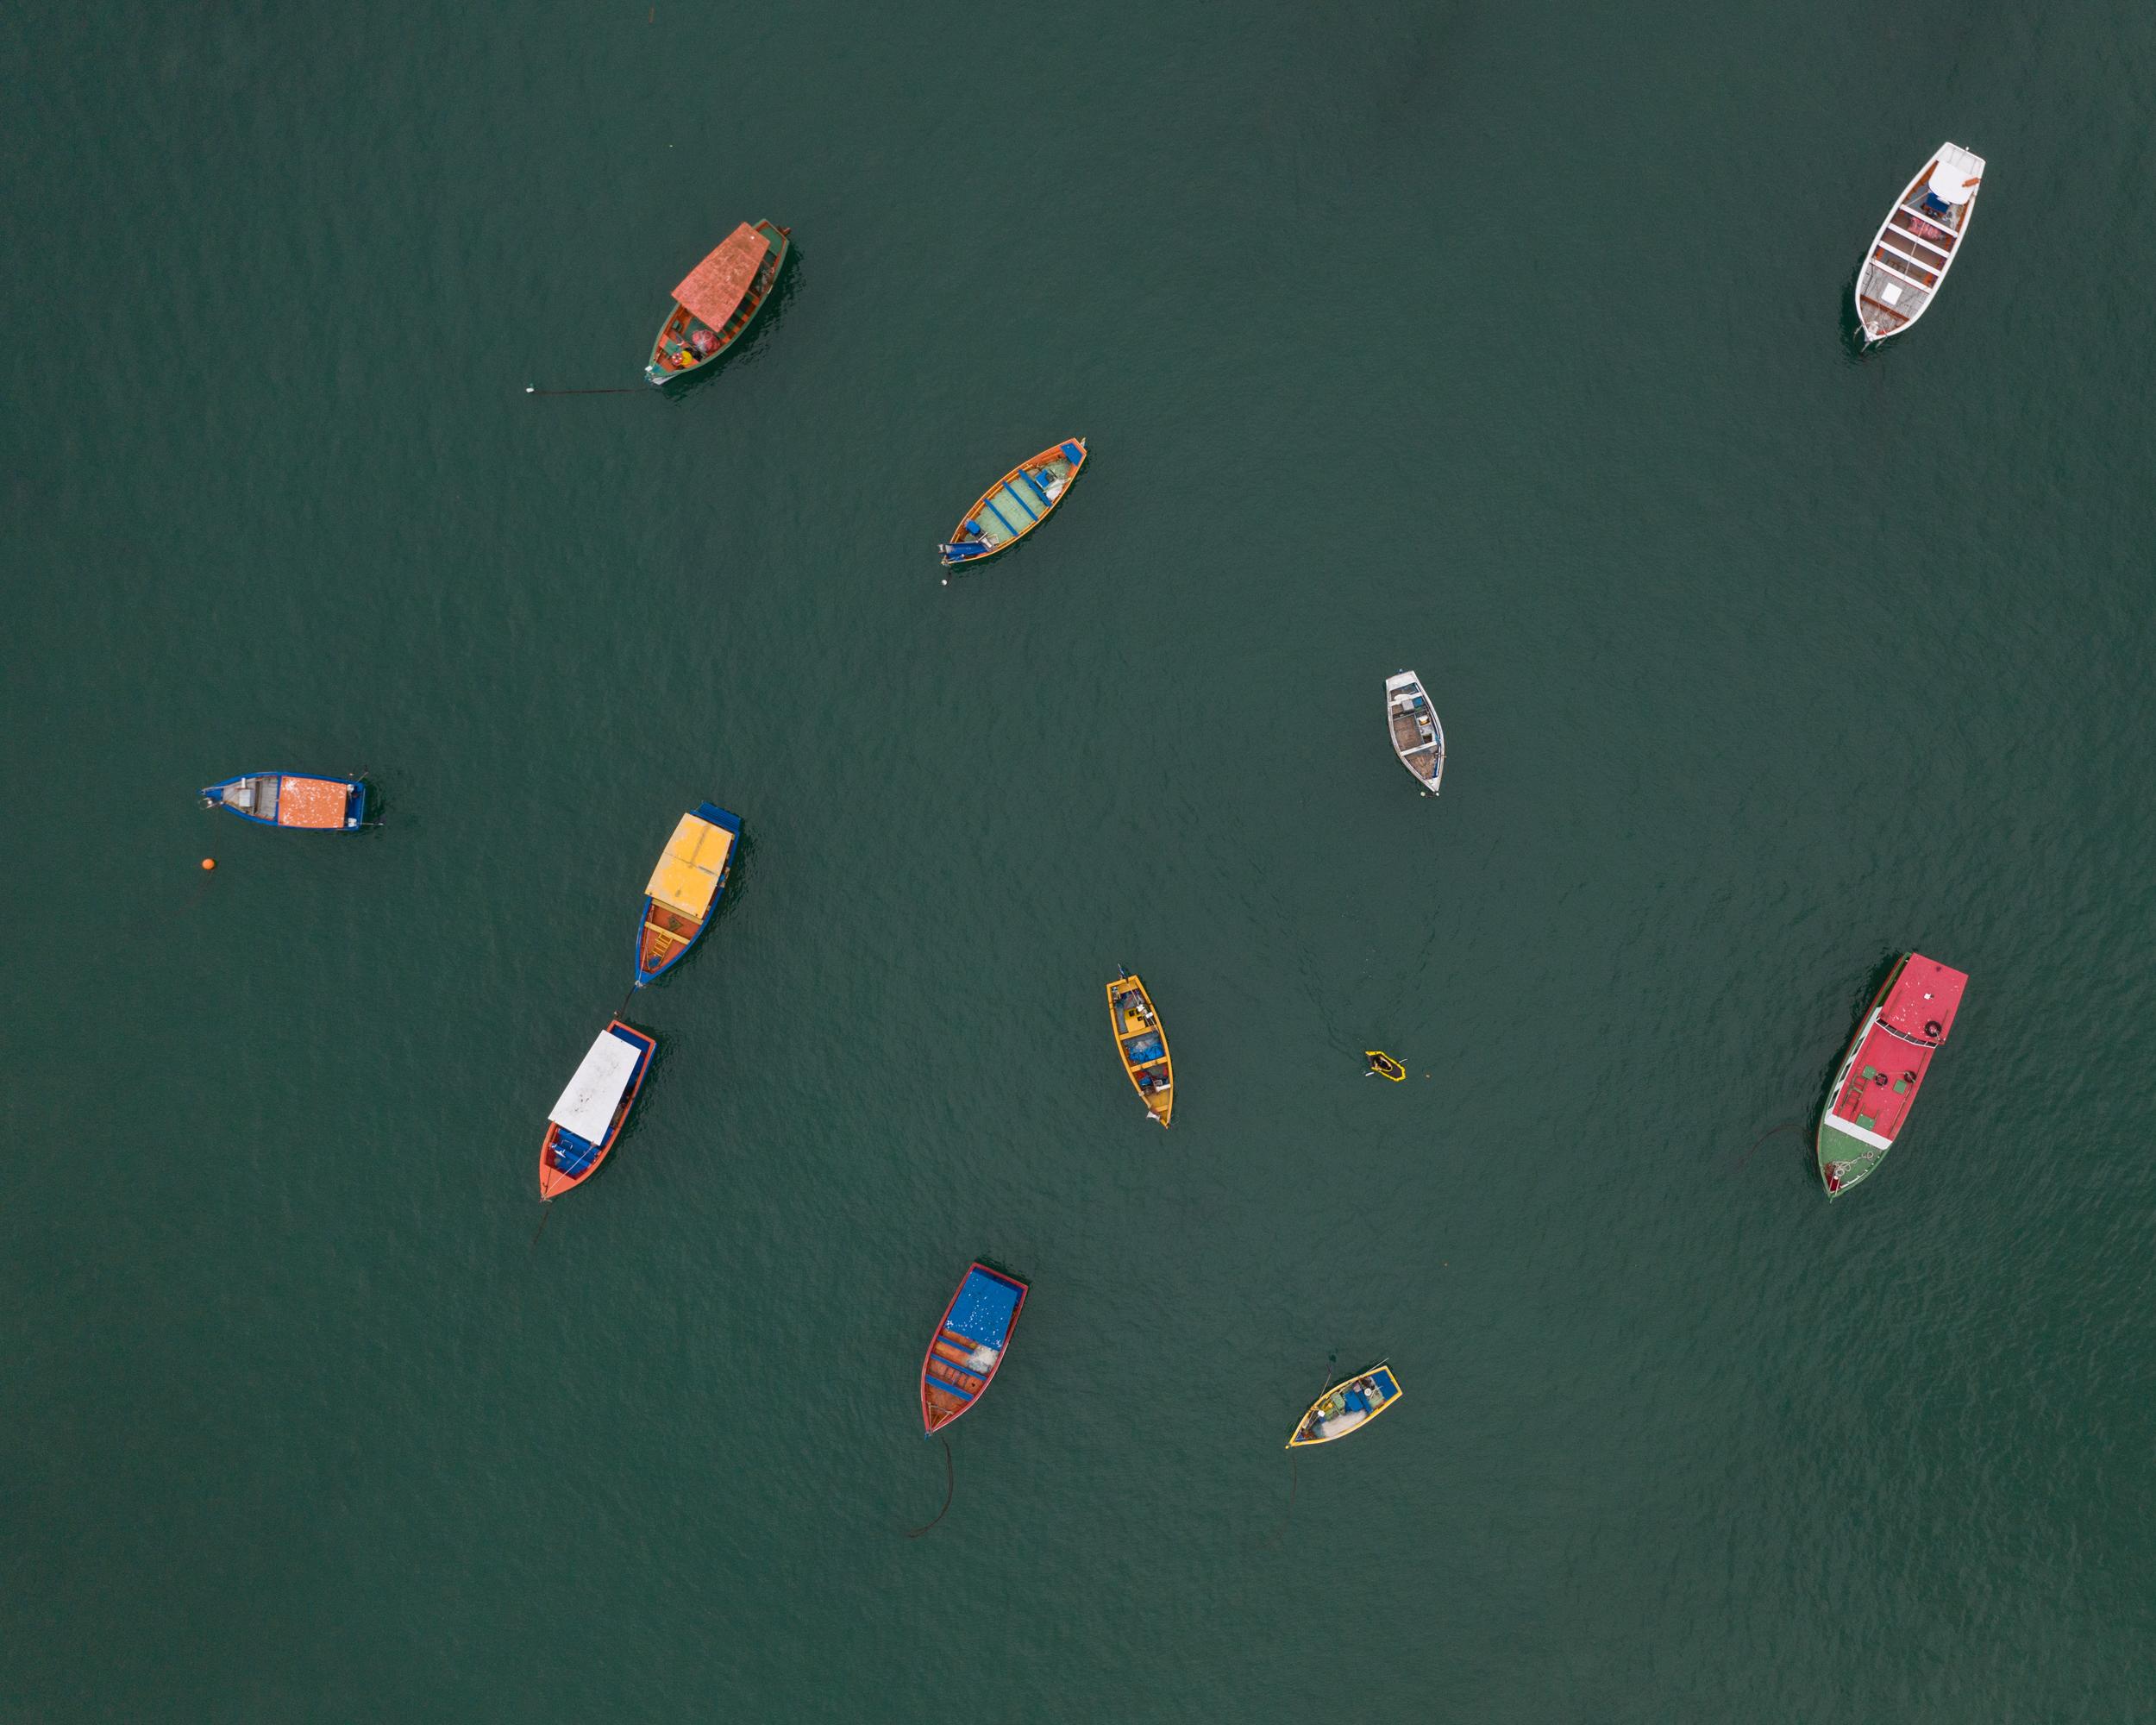 TannerWendellStewart_Brazil_Rogue_traveling_ocean_HighRes_1stPartyPrintDigital-0768.jpg